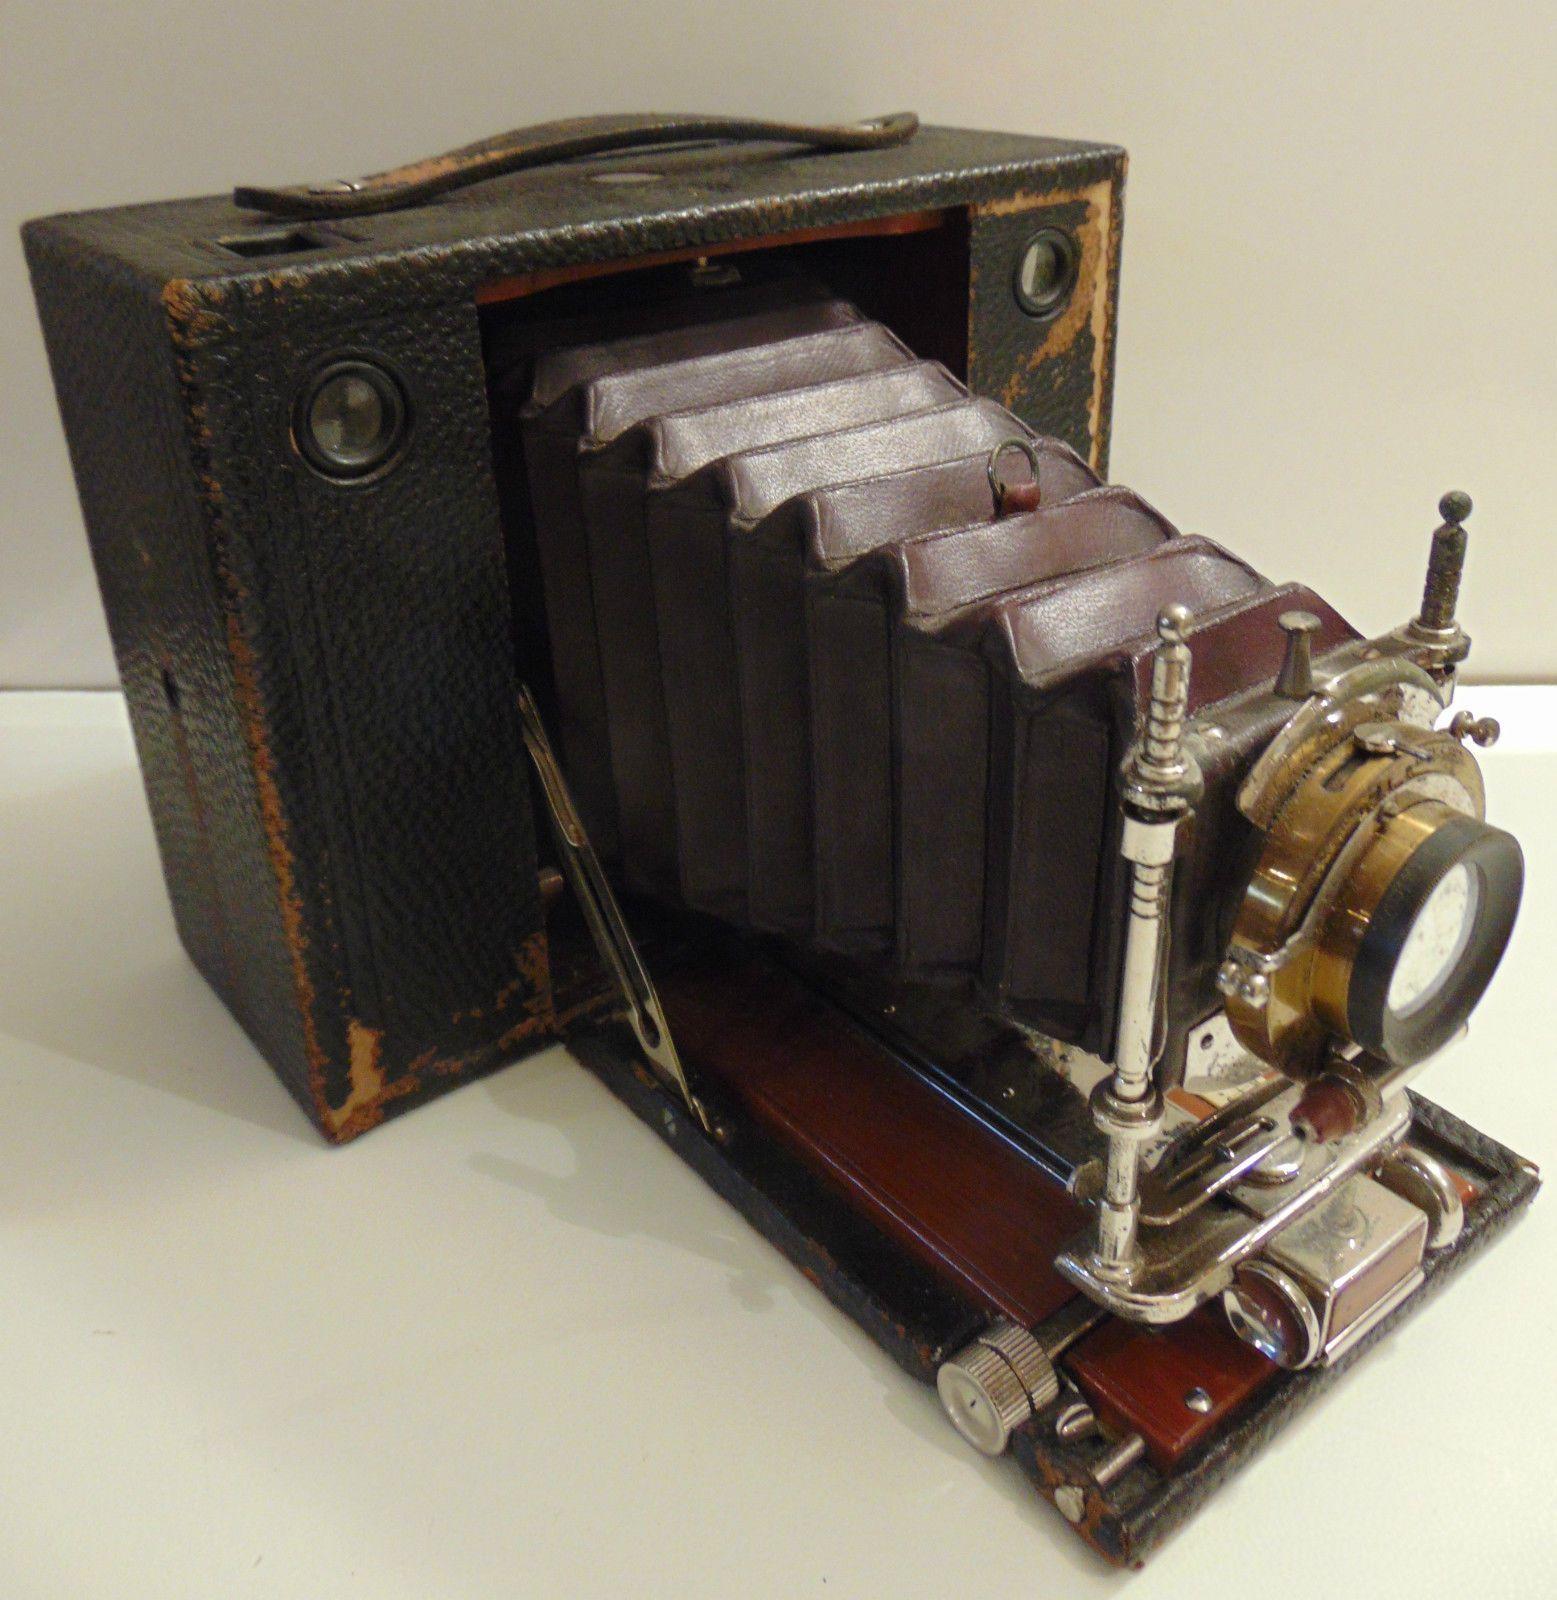 ancien appareil photo kodak n 4 cartridge soufflet